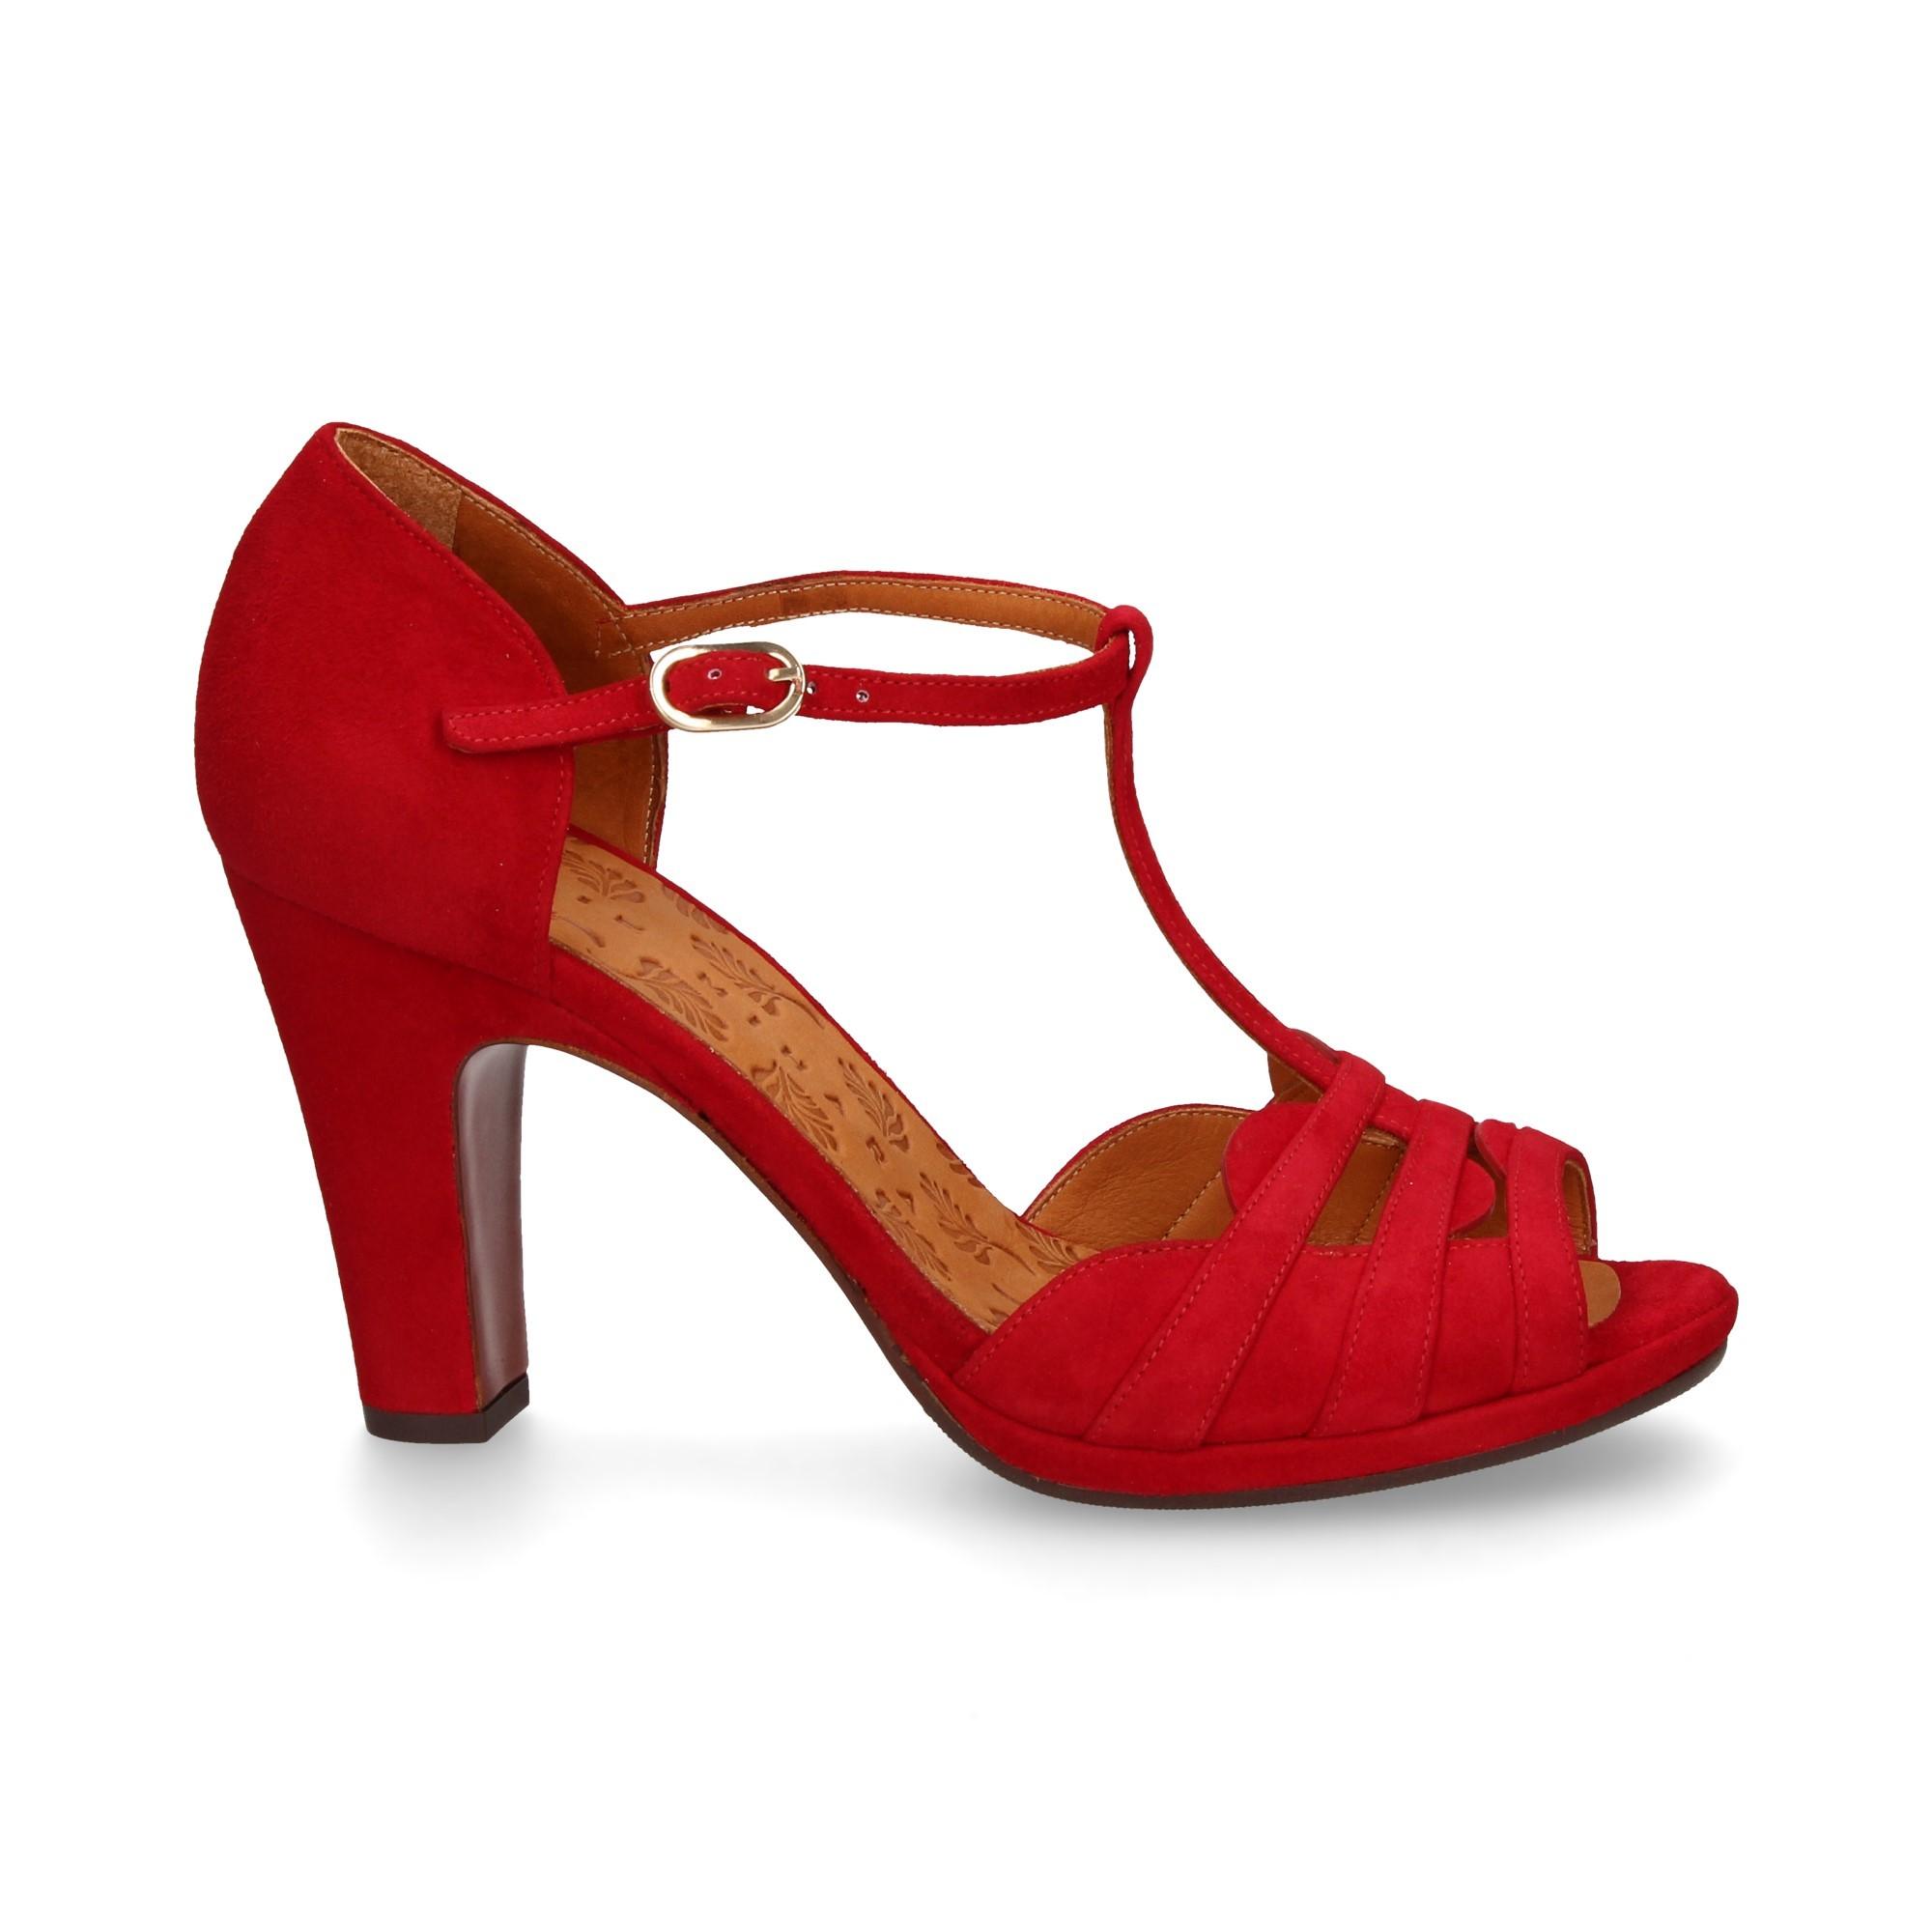 8a2fbbec4 CHIE MIHARA Women's heeled sandals ALOE ROJO